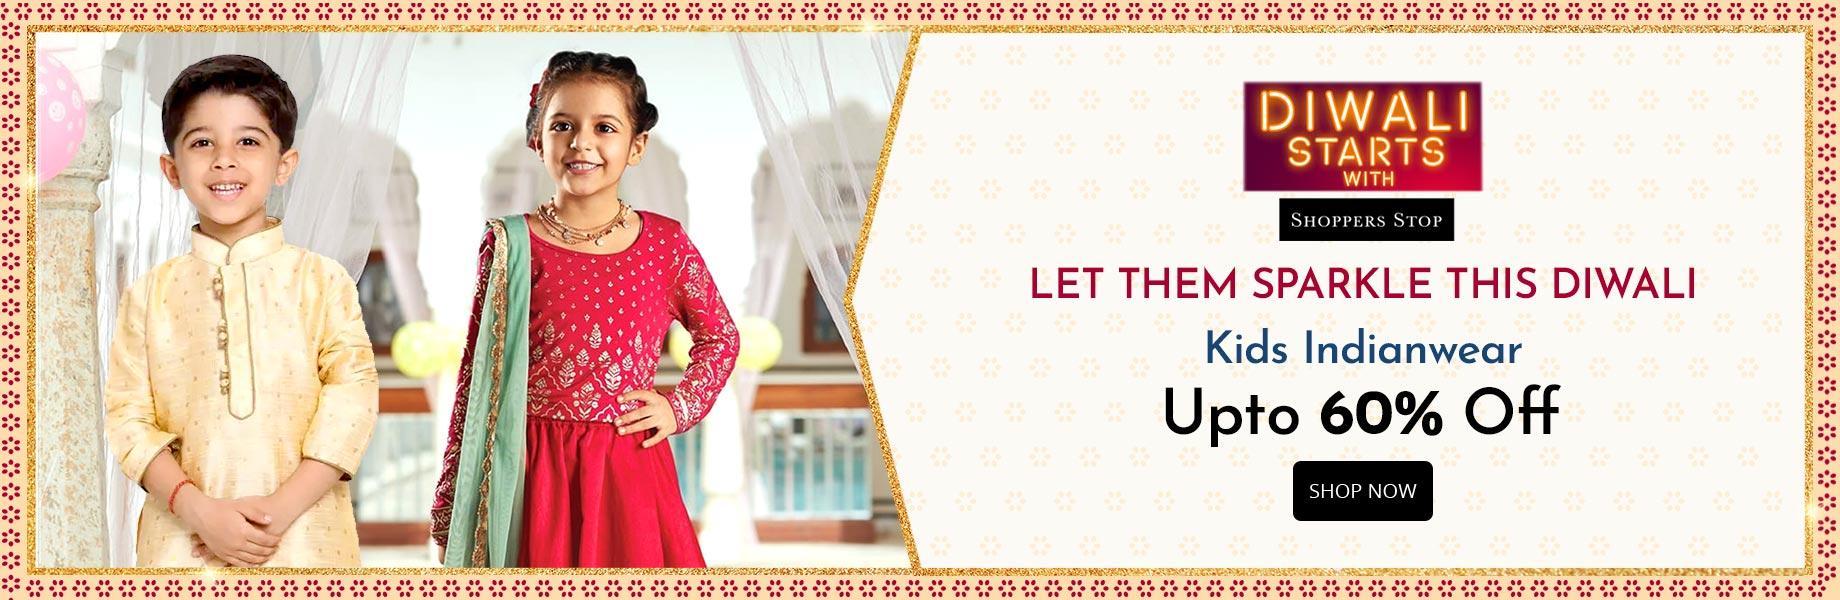 Homepage-Carousals-Kids-Indian-wear-Web.jpg